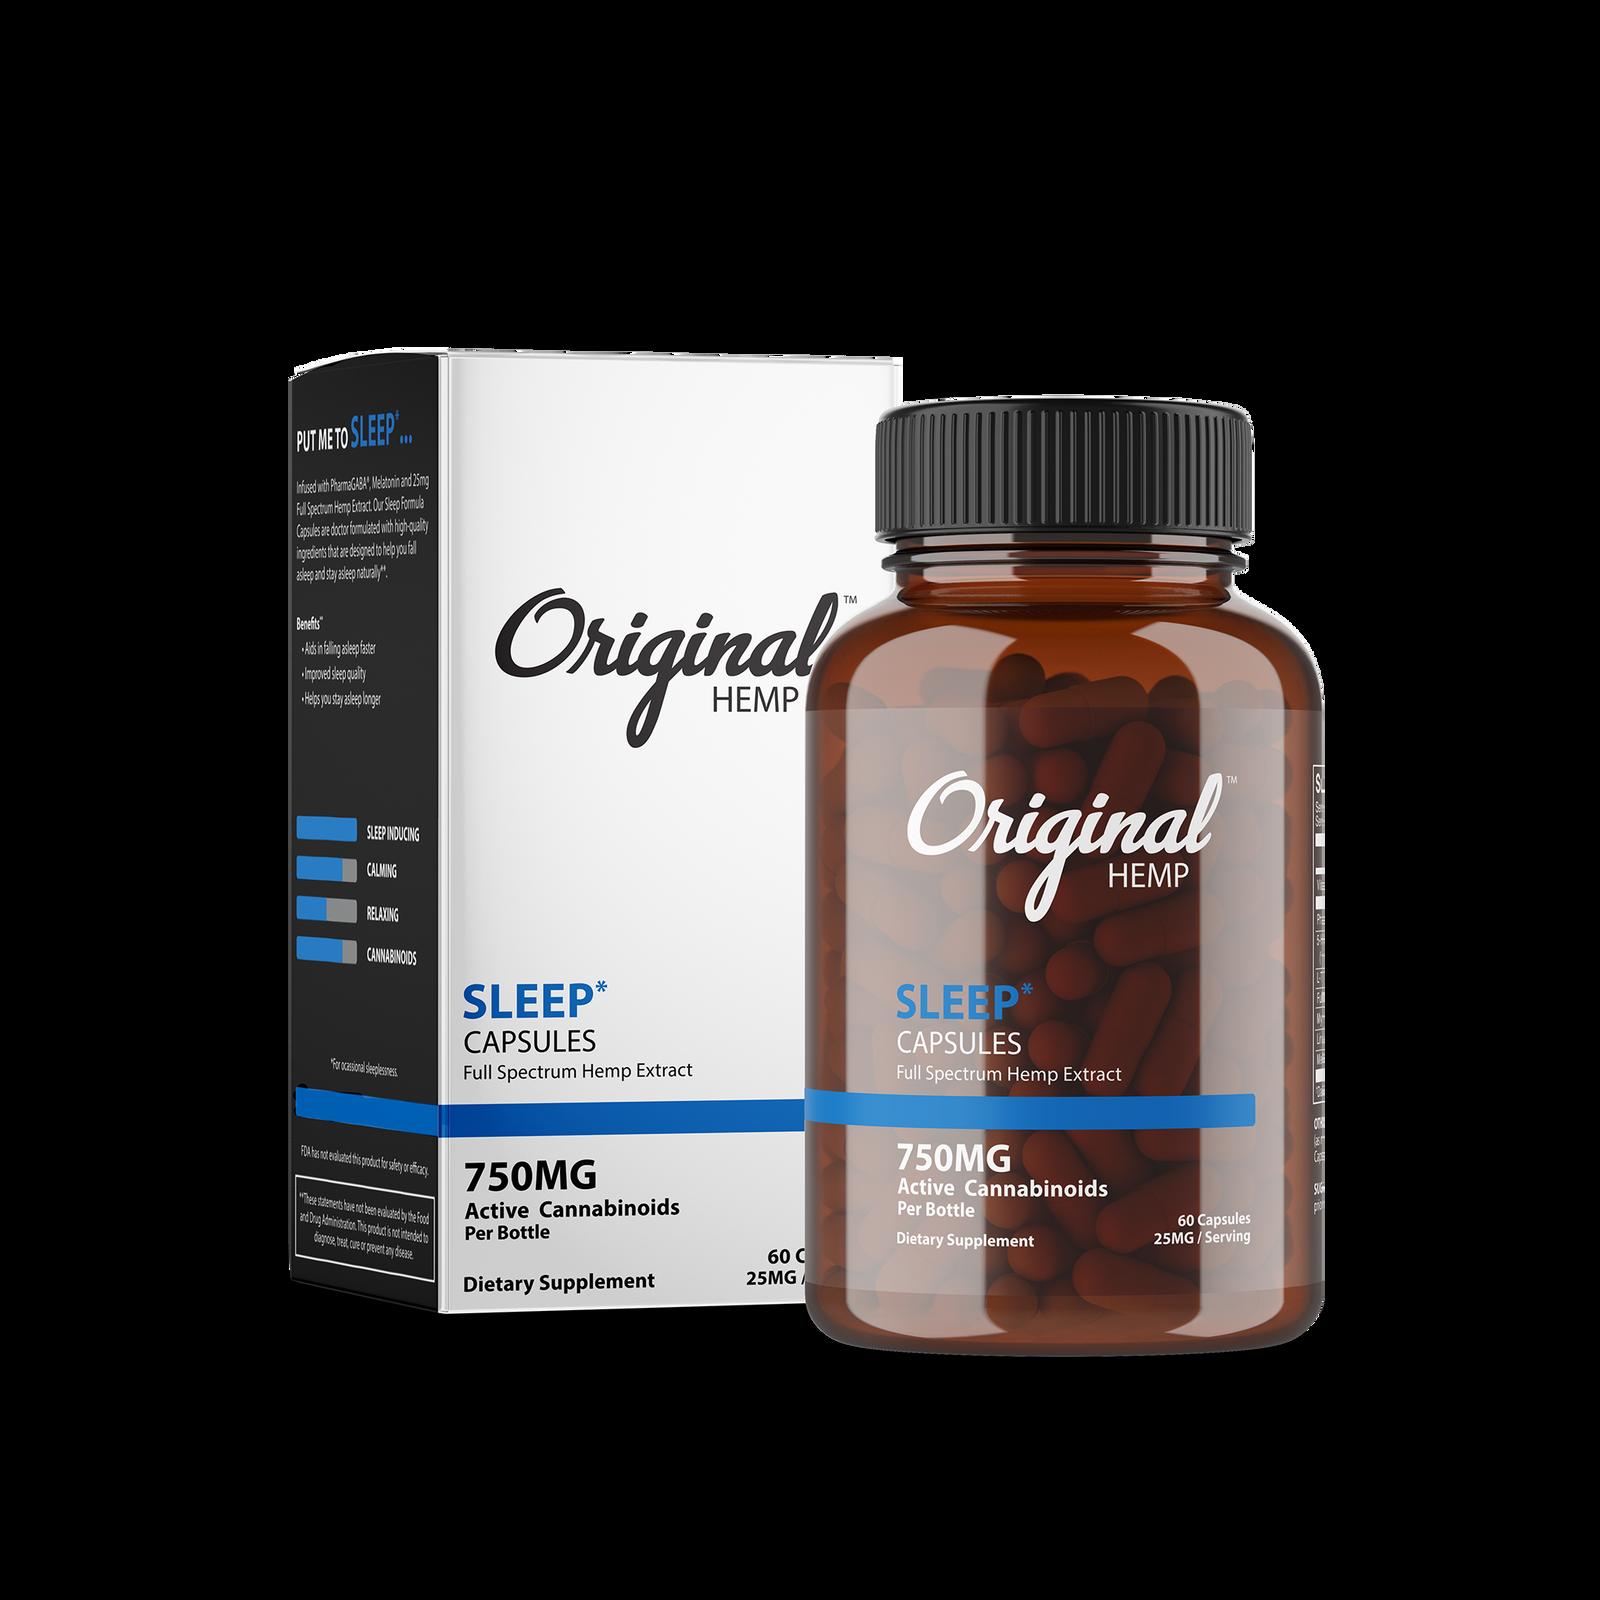 Original Hemp Sleep Capsules - 750 mg